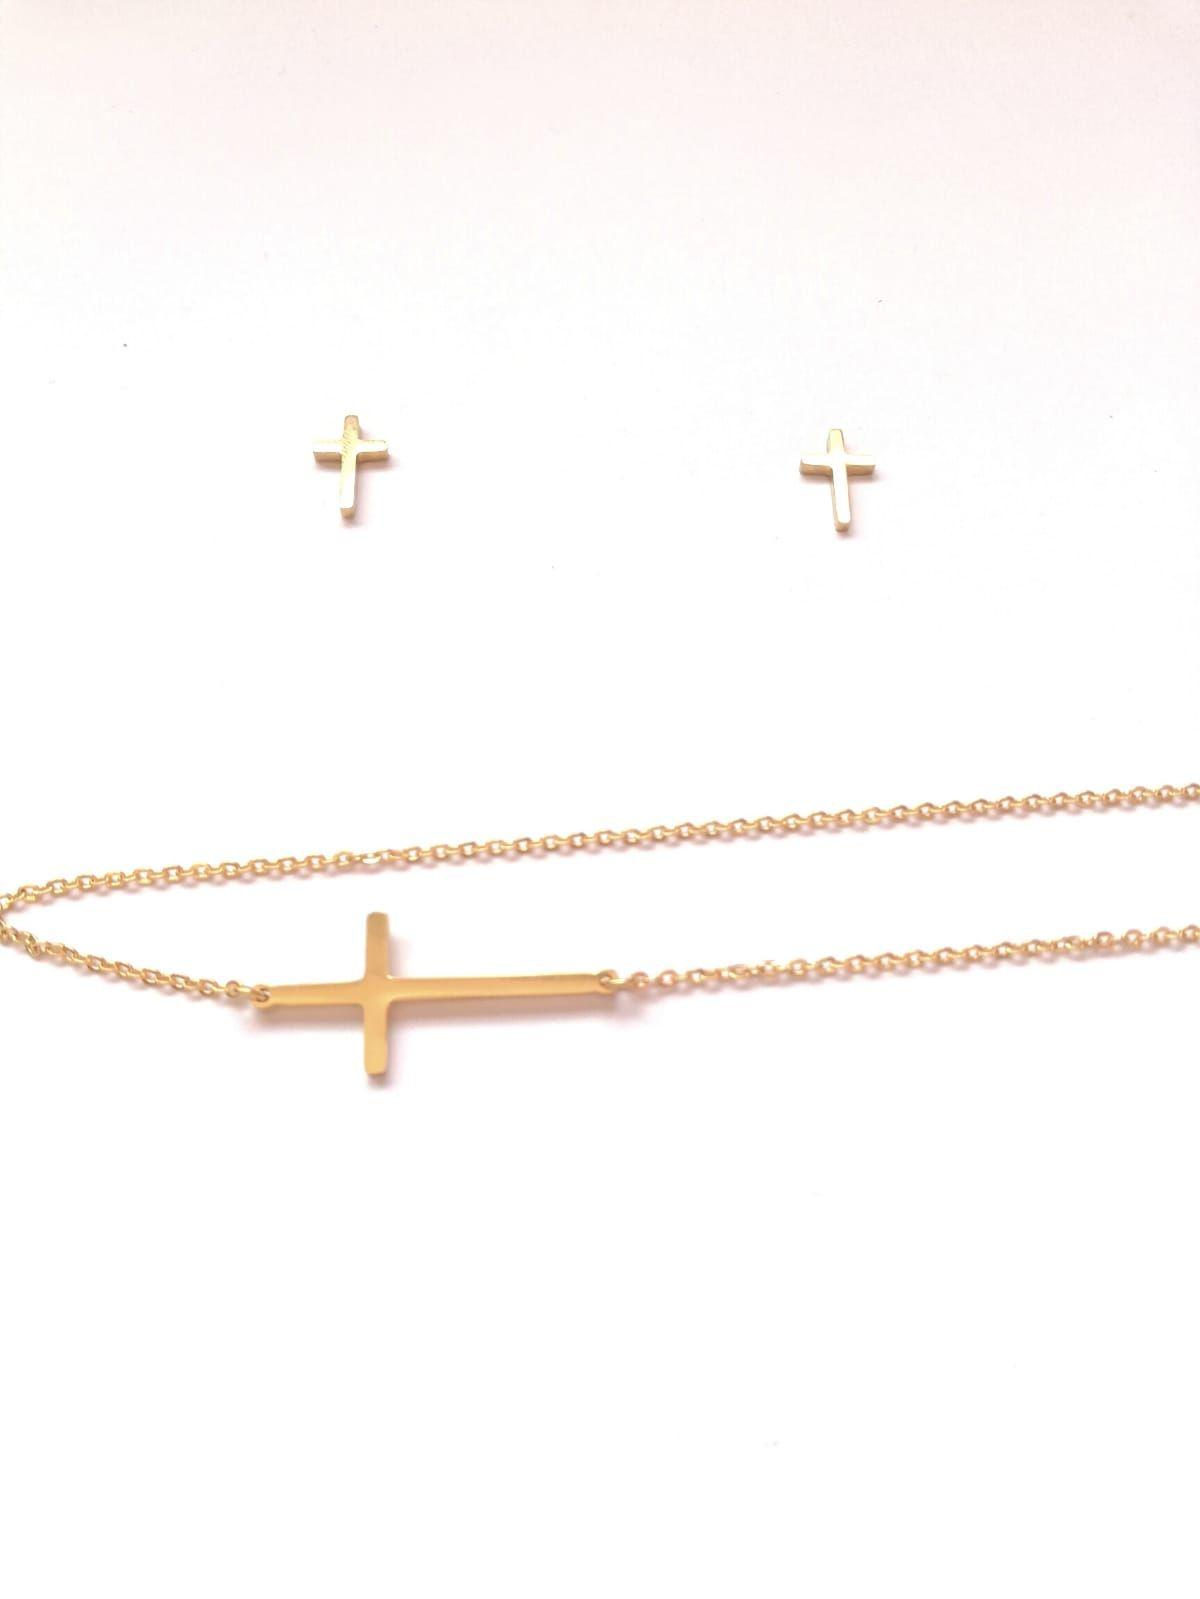 9476bcf808e1 Pendientes cruces+cadena con cruz de acero color dorado tendencia  complementos